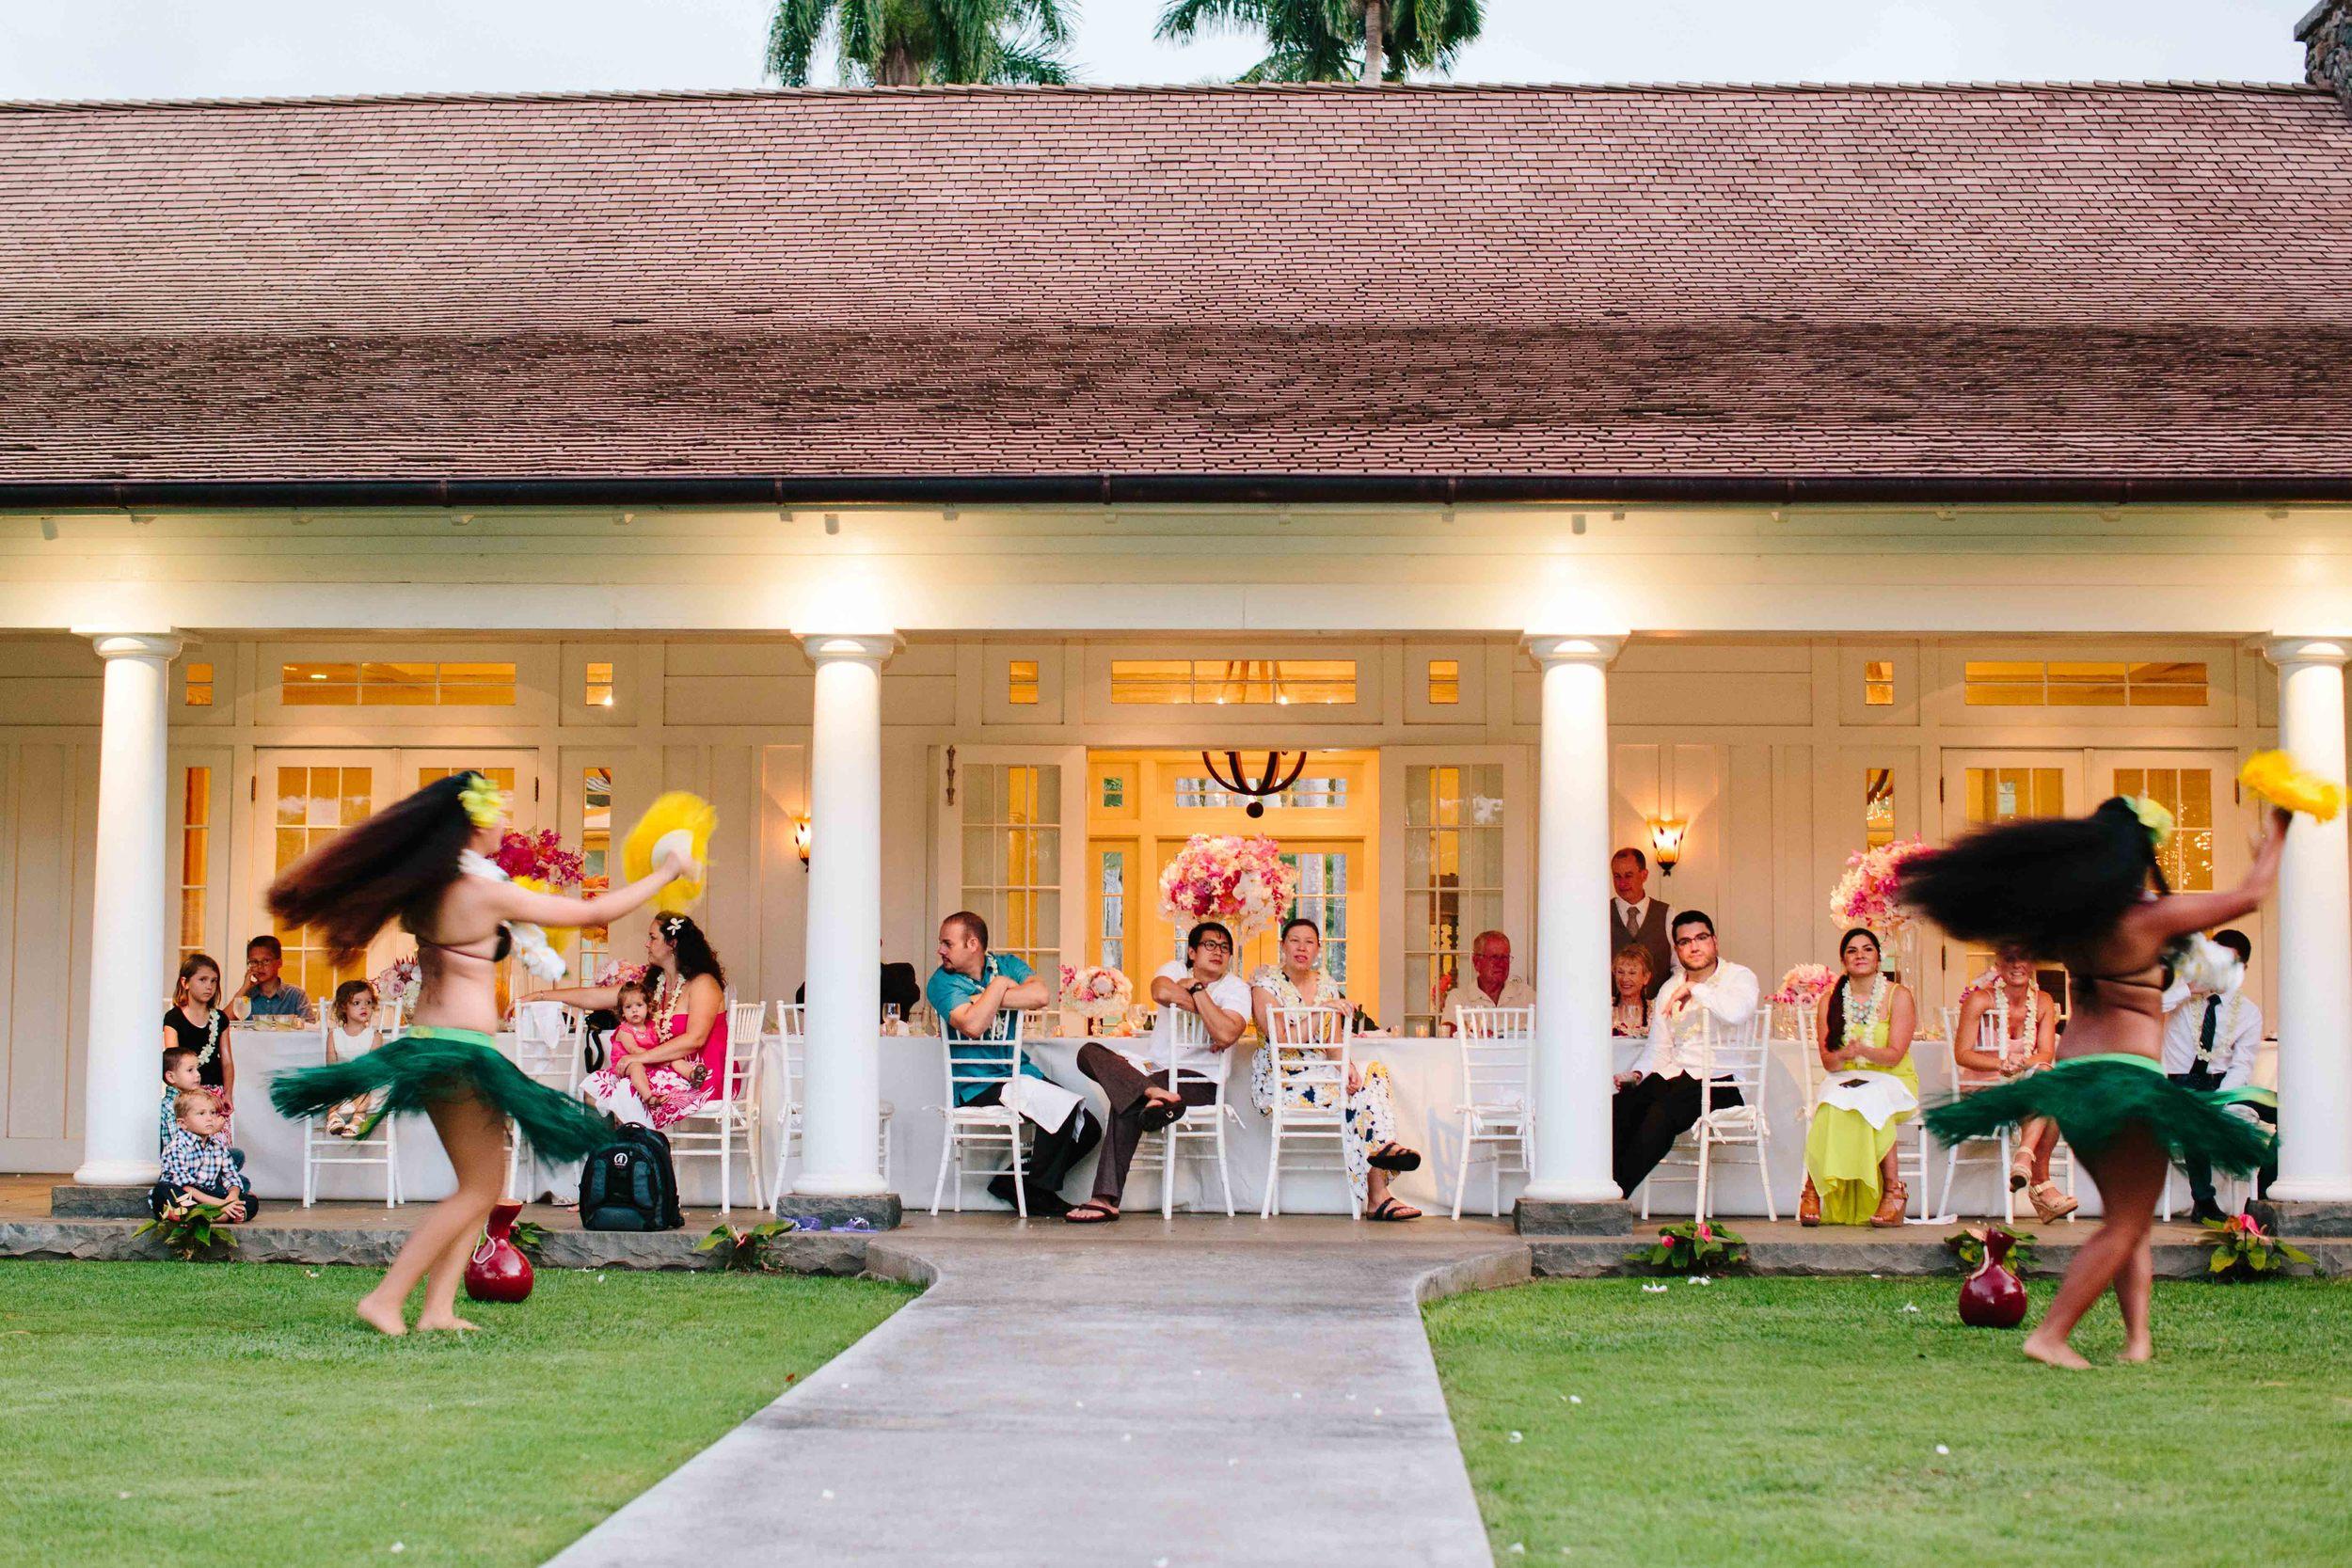 Hula Dancers at Dillingham Ranch Wedding Reception